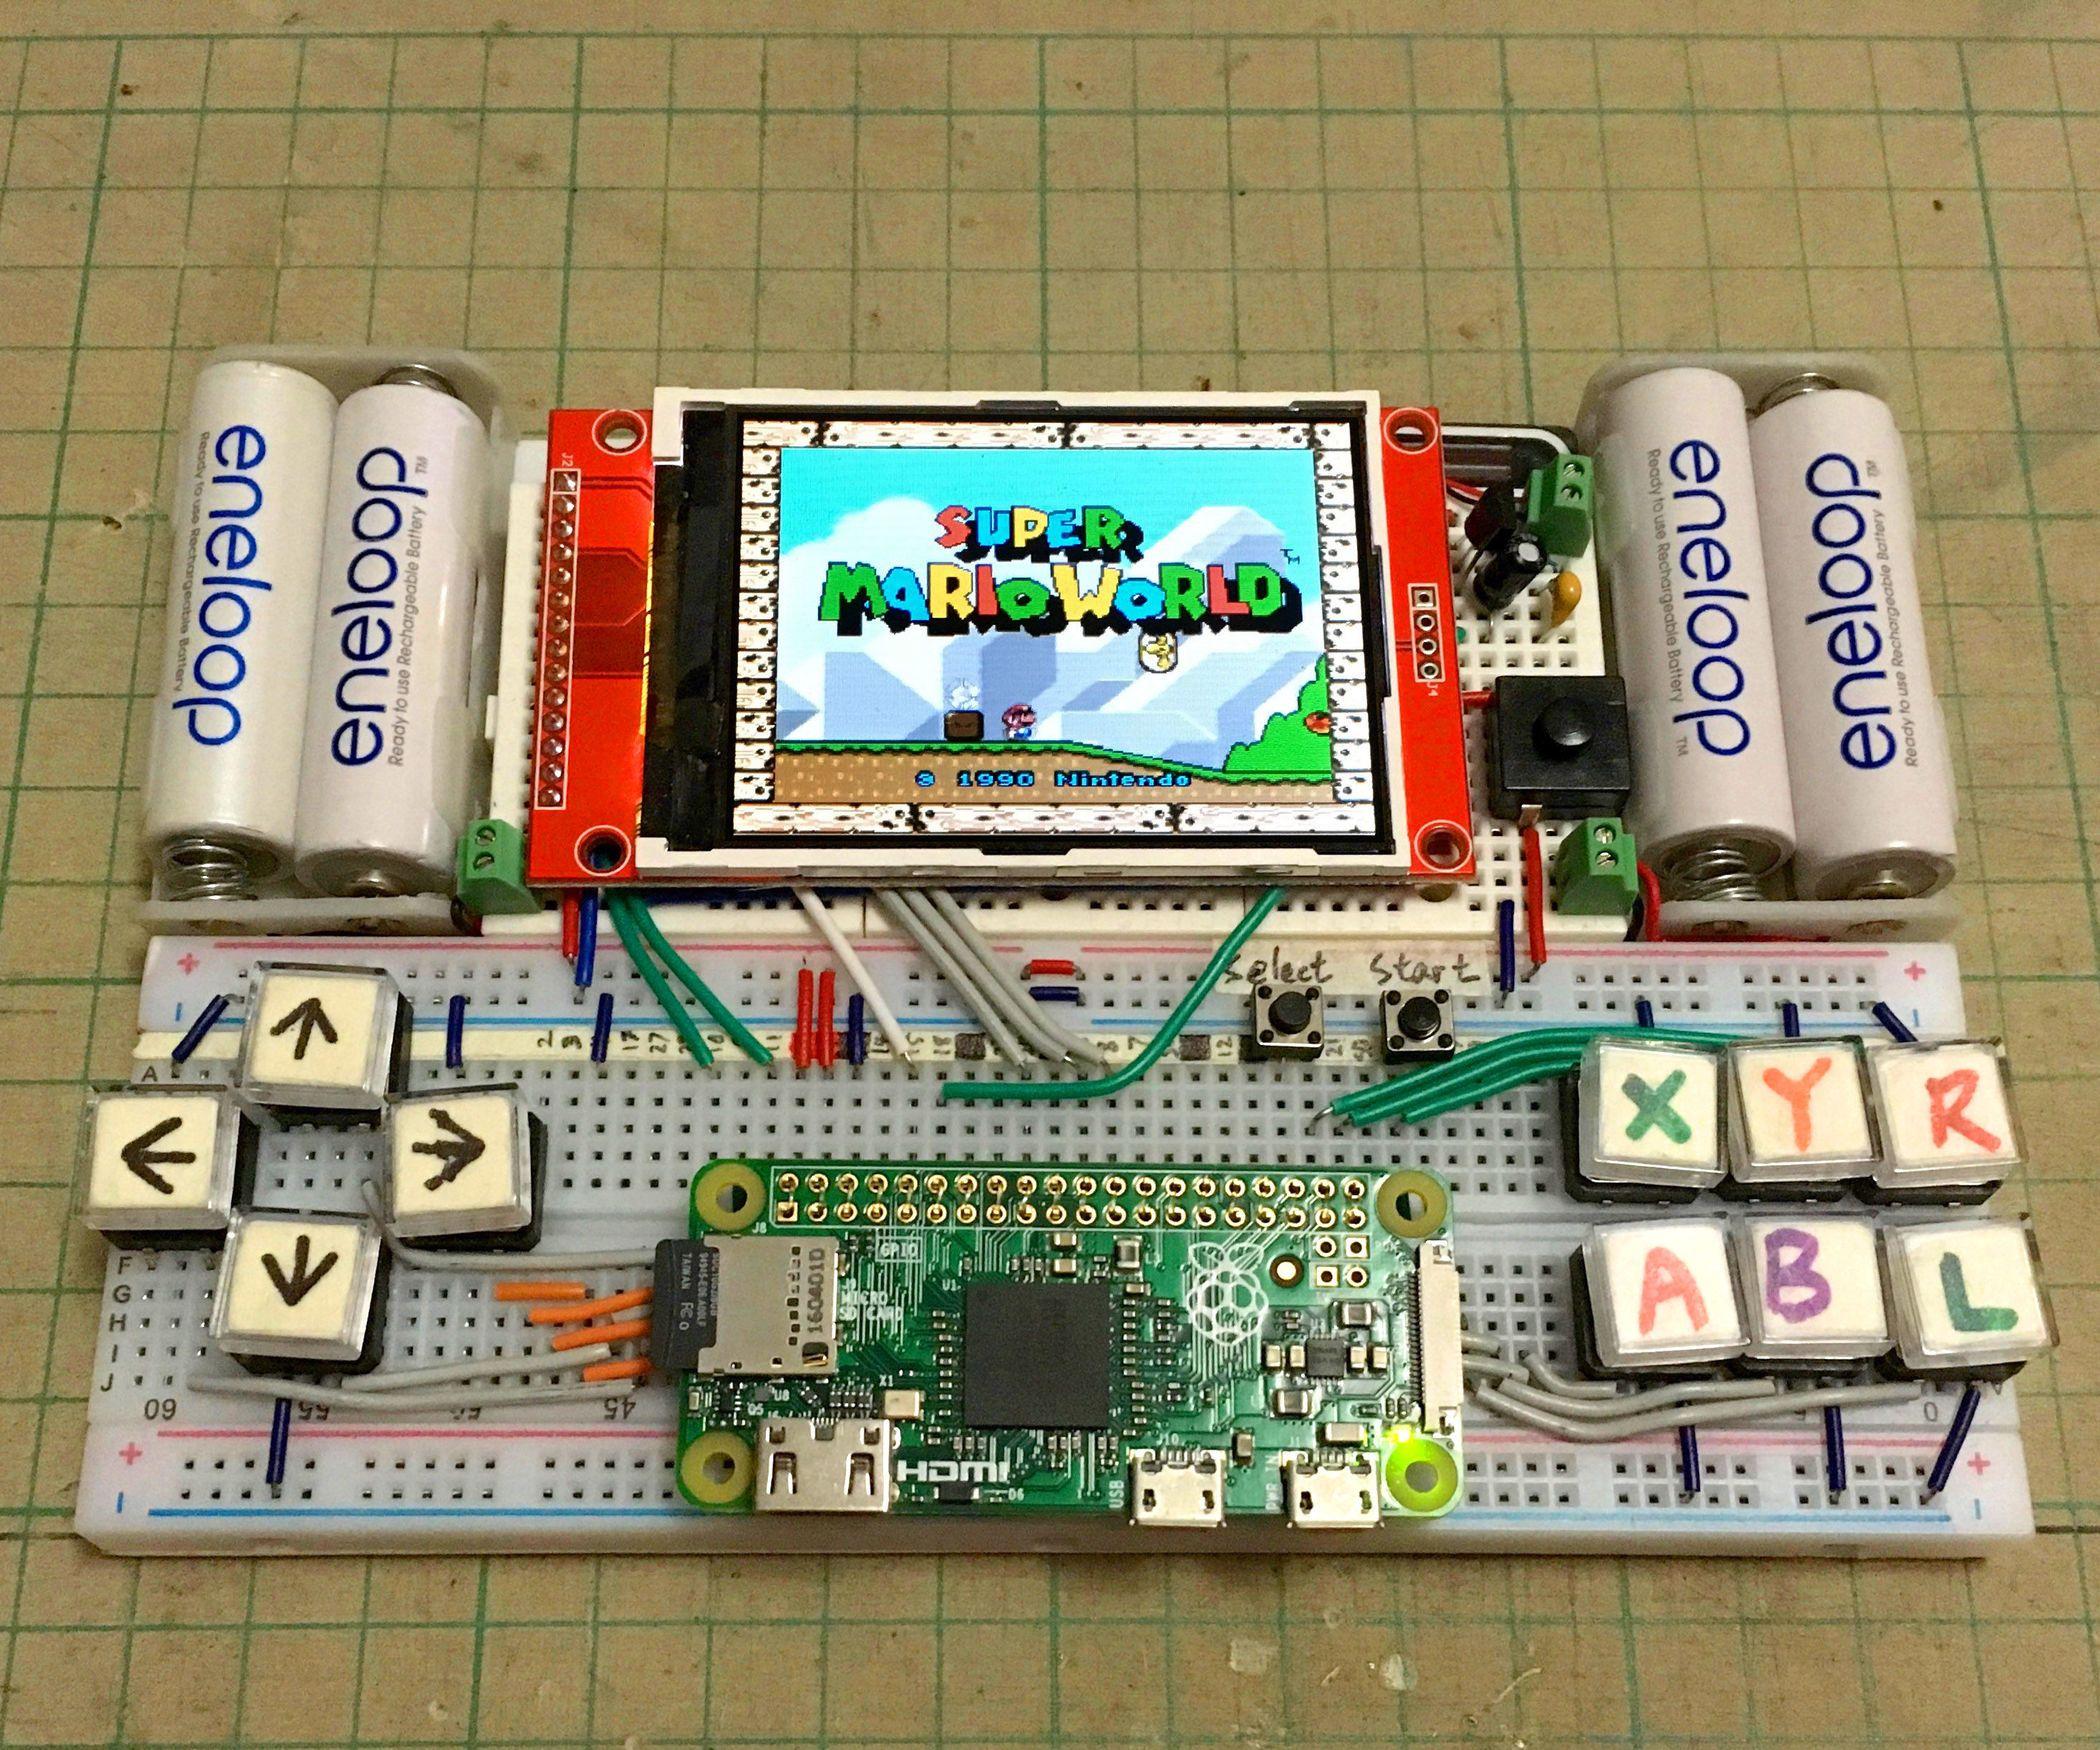 Breadboard RetroPie 3D Printing, Raspberry pi projects